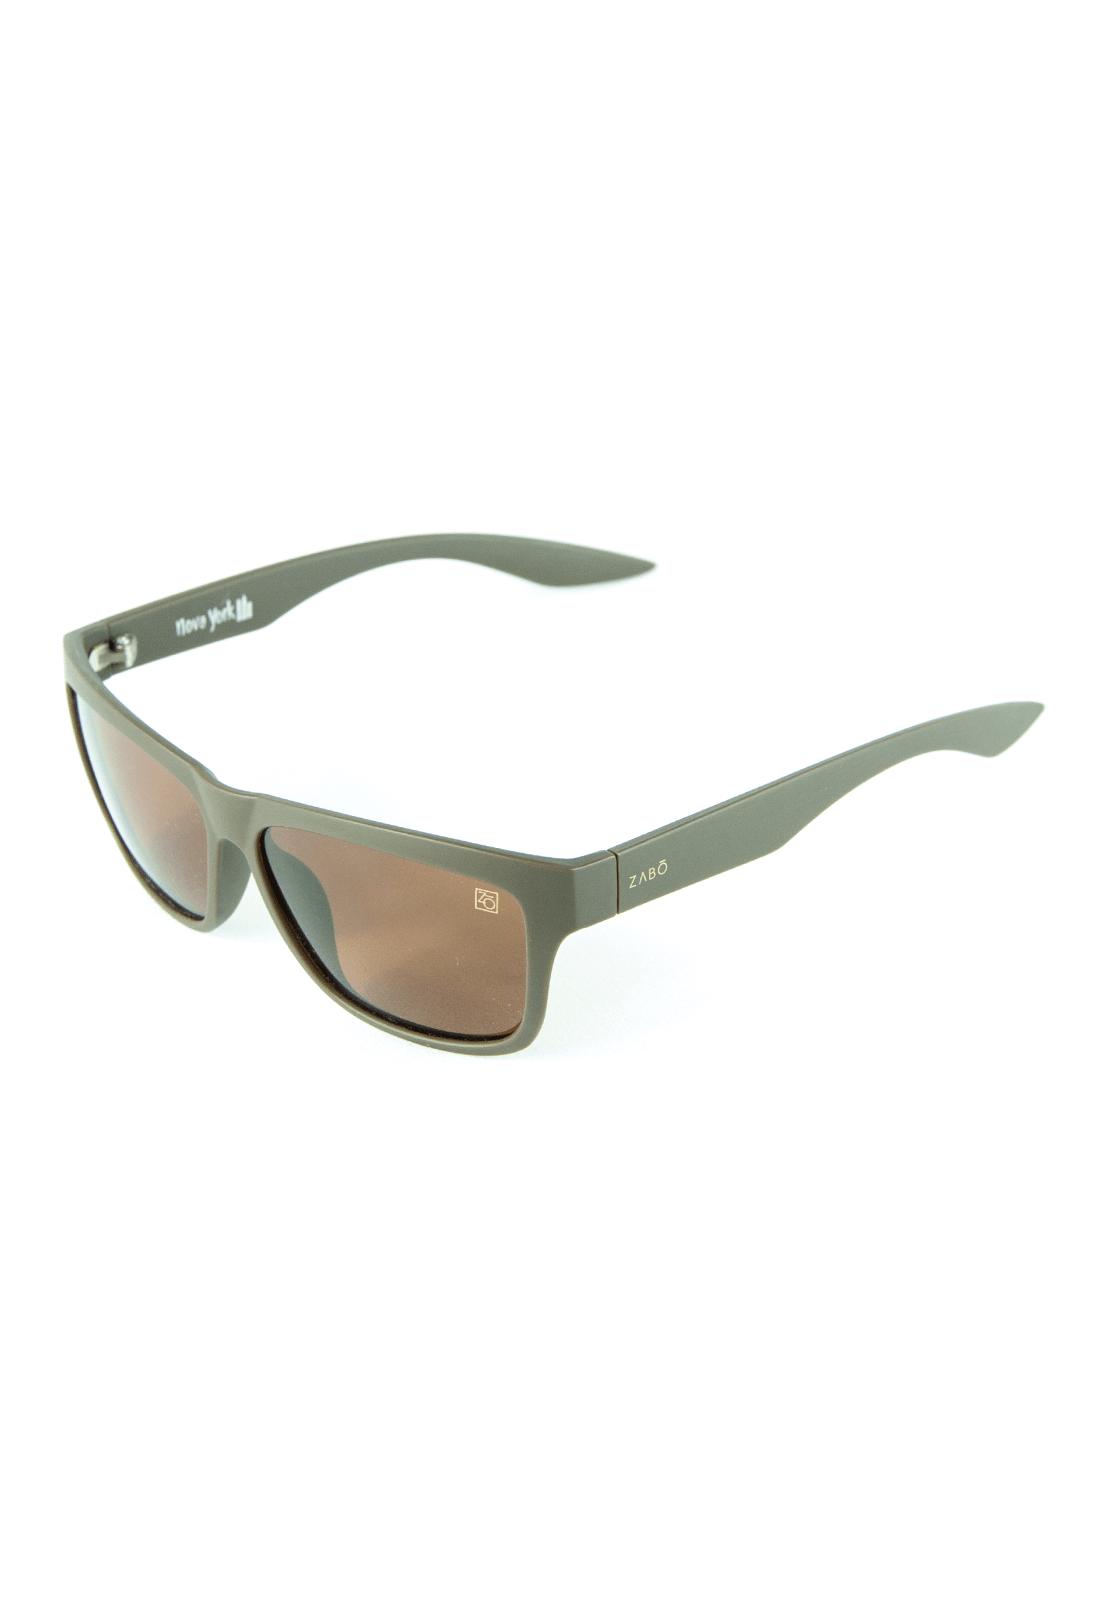 Óculos de Sol Polarizado Zabô Nova York Marrom